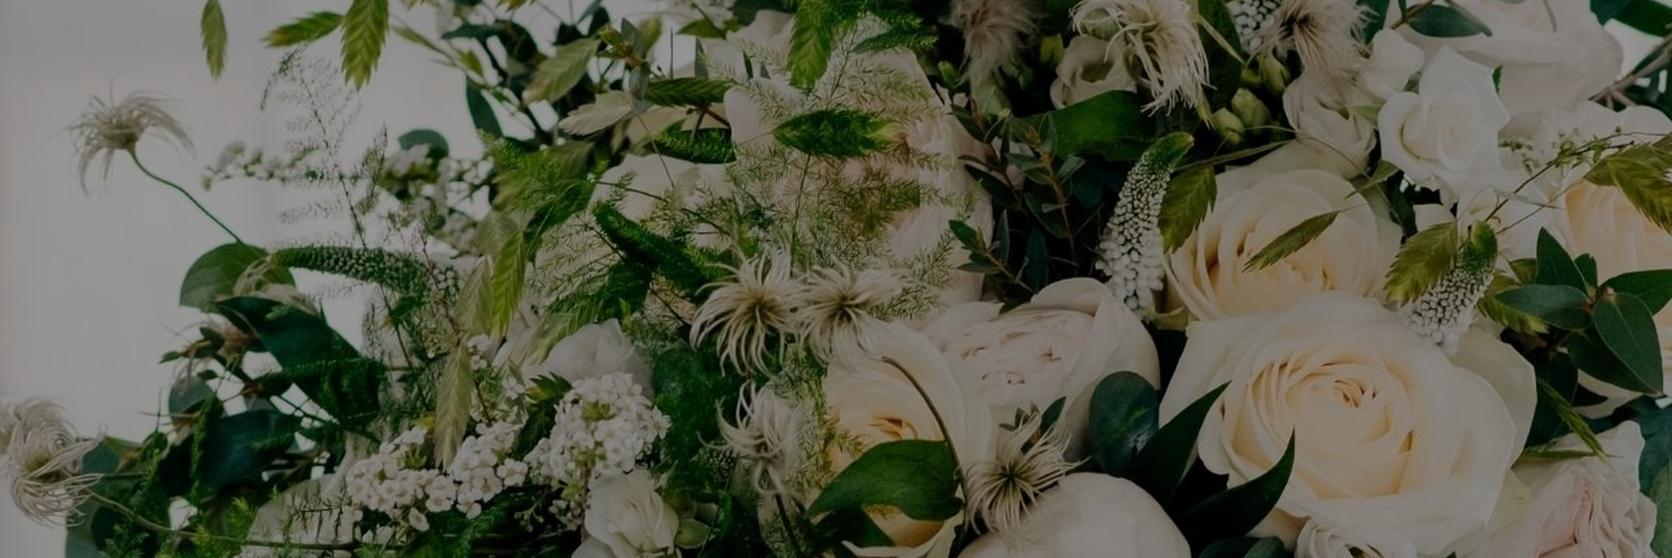 great-british-bloom-off-2